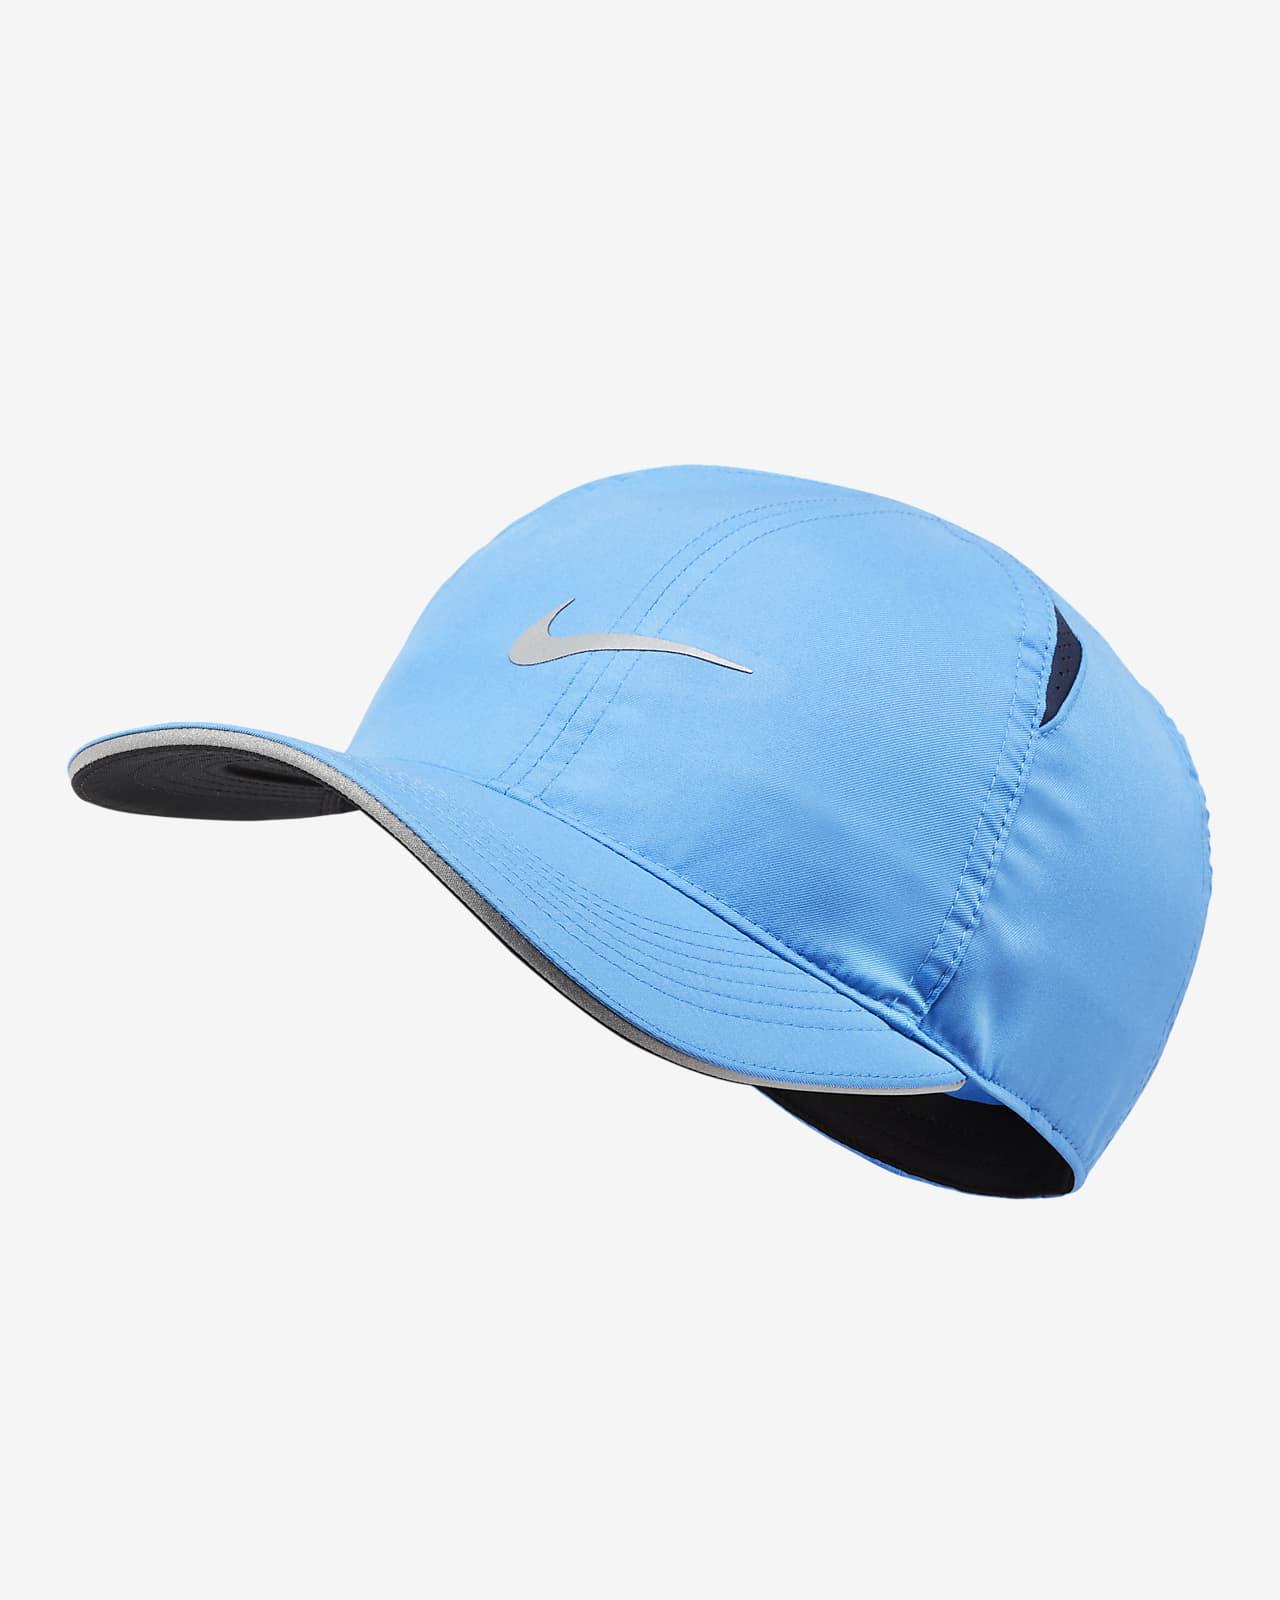 Nike AeroBill Featherlight 跑步帽款